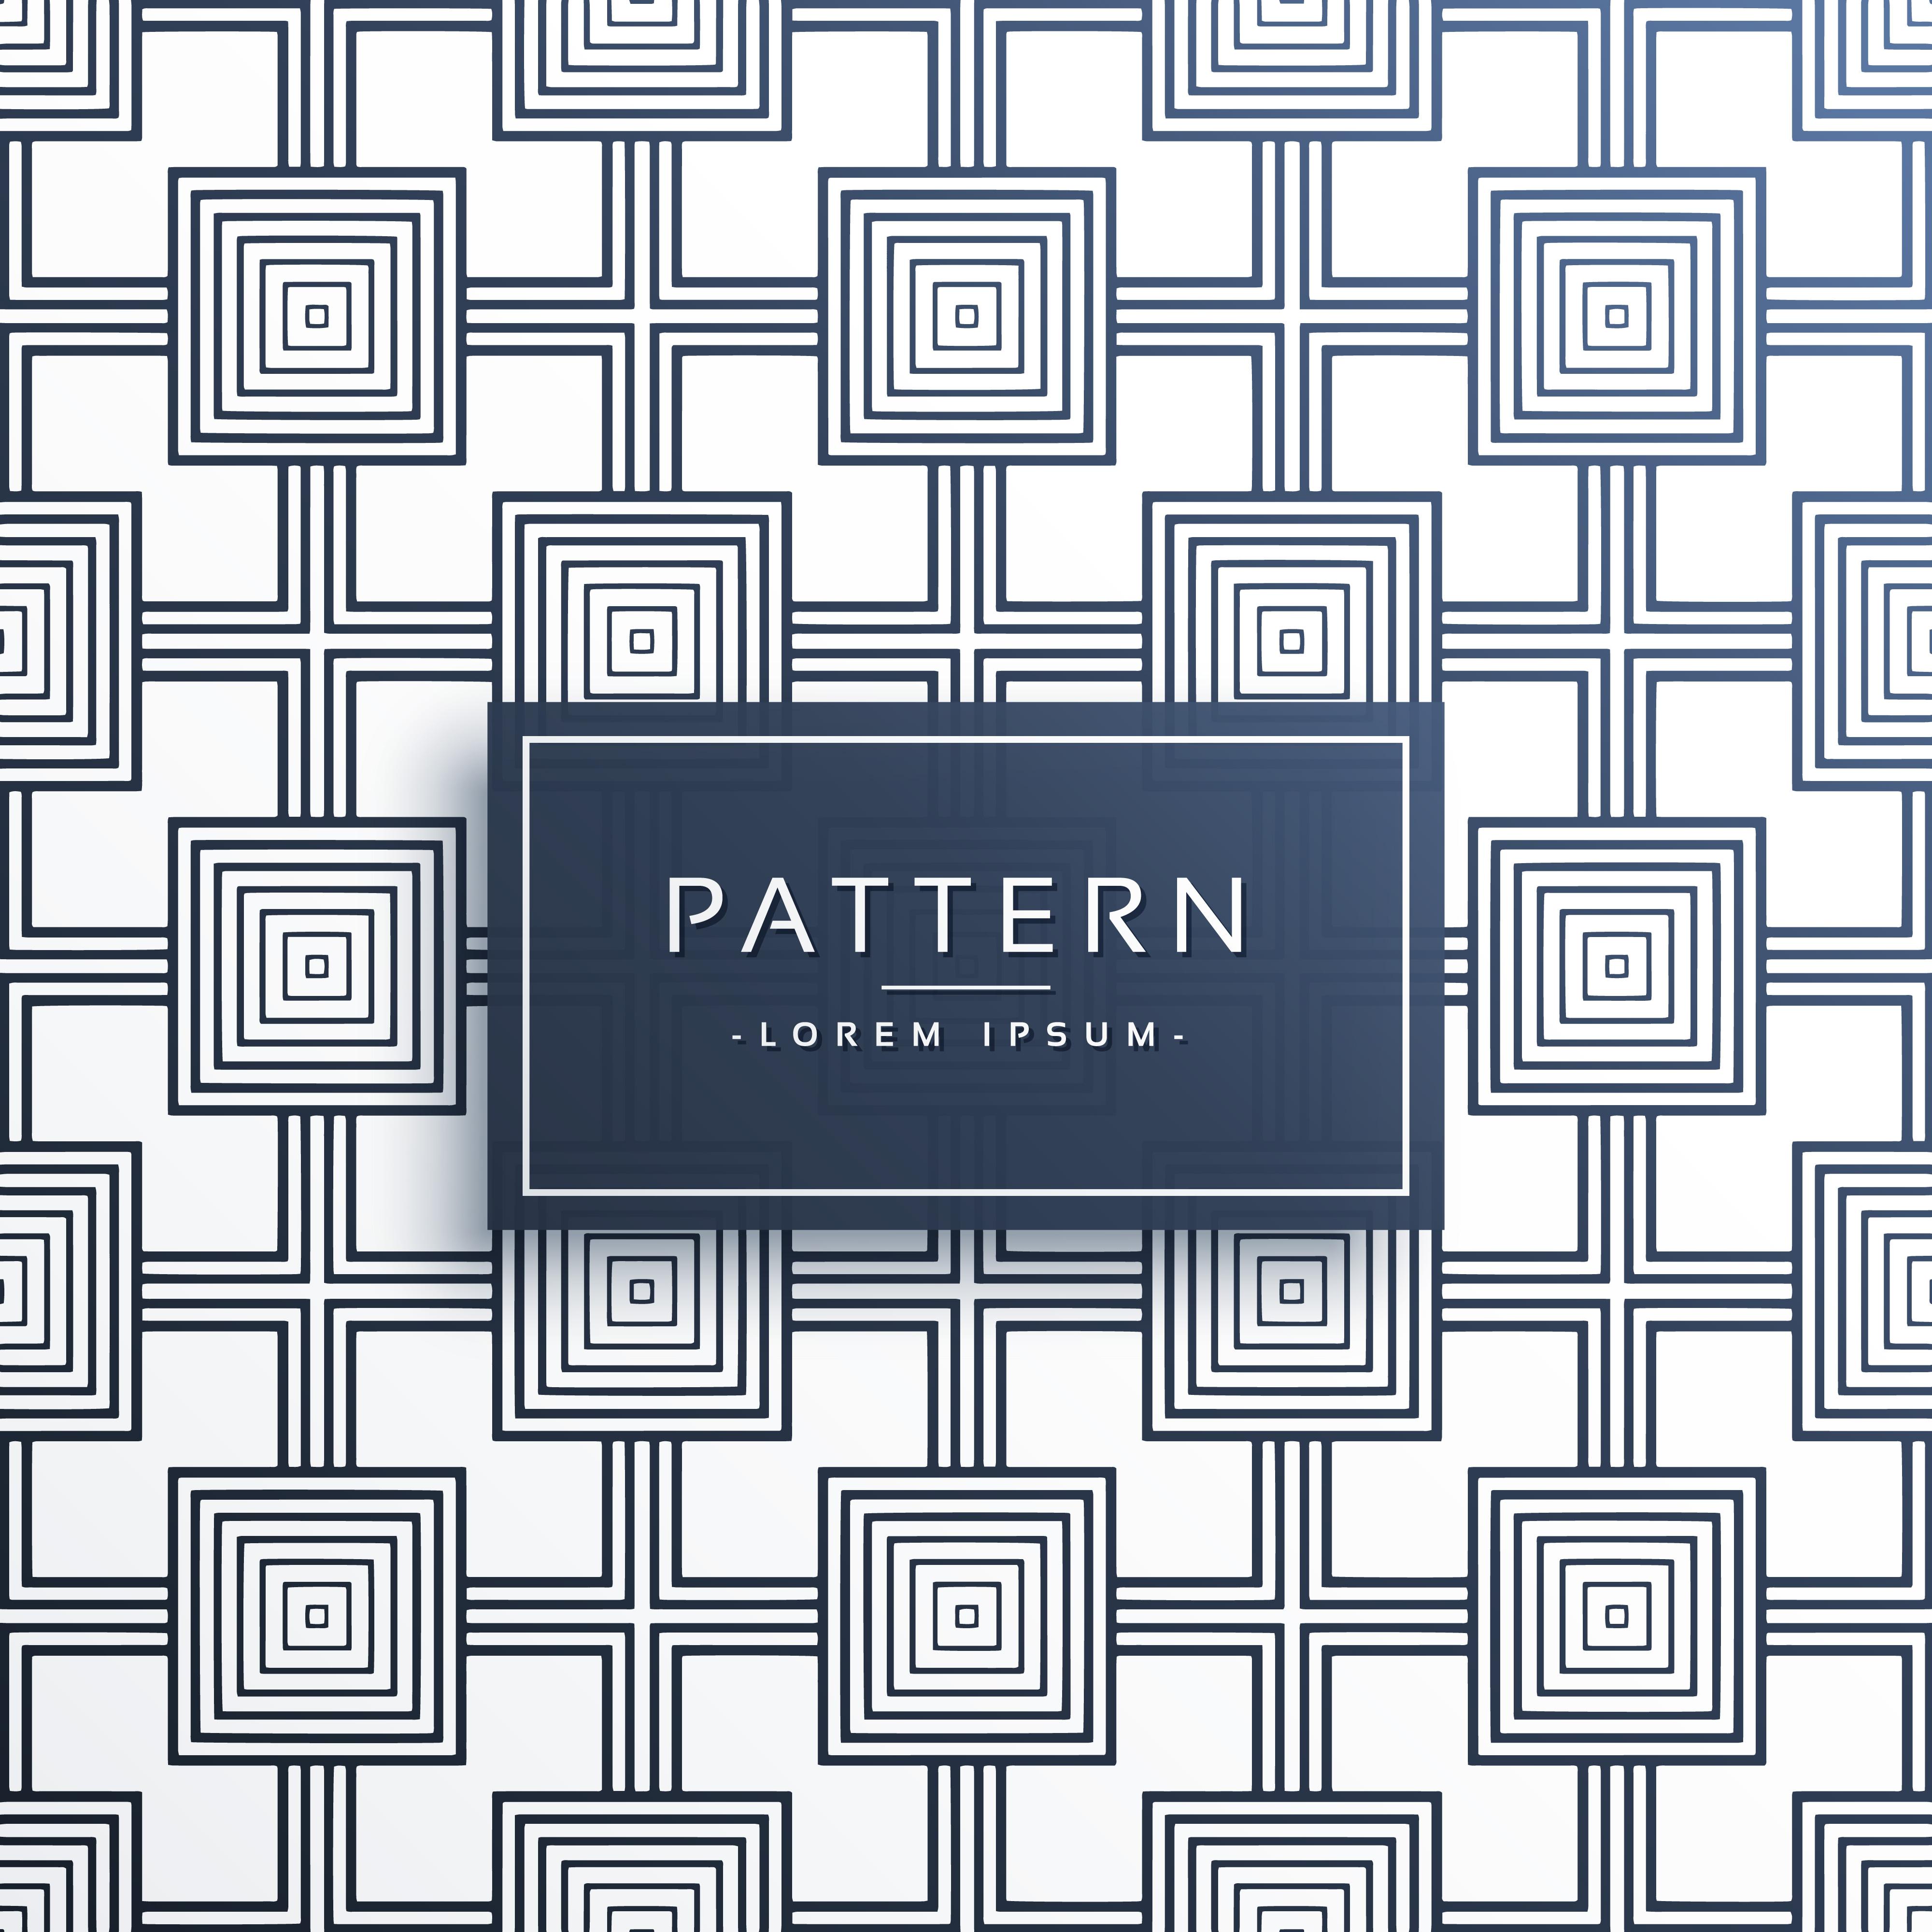 Geometric Square Style Modern Pattern Design